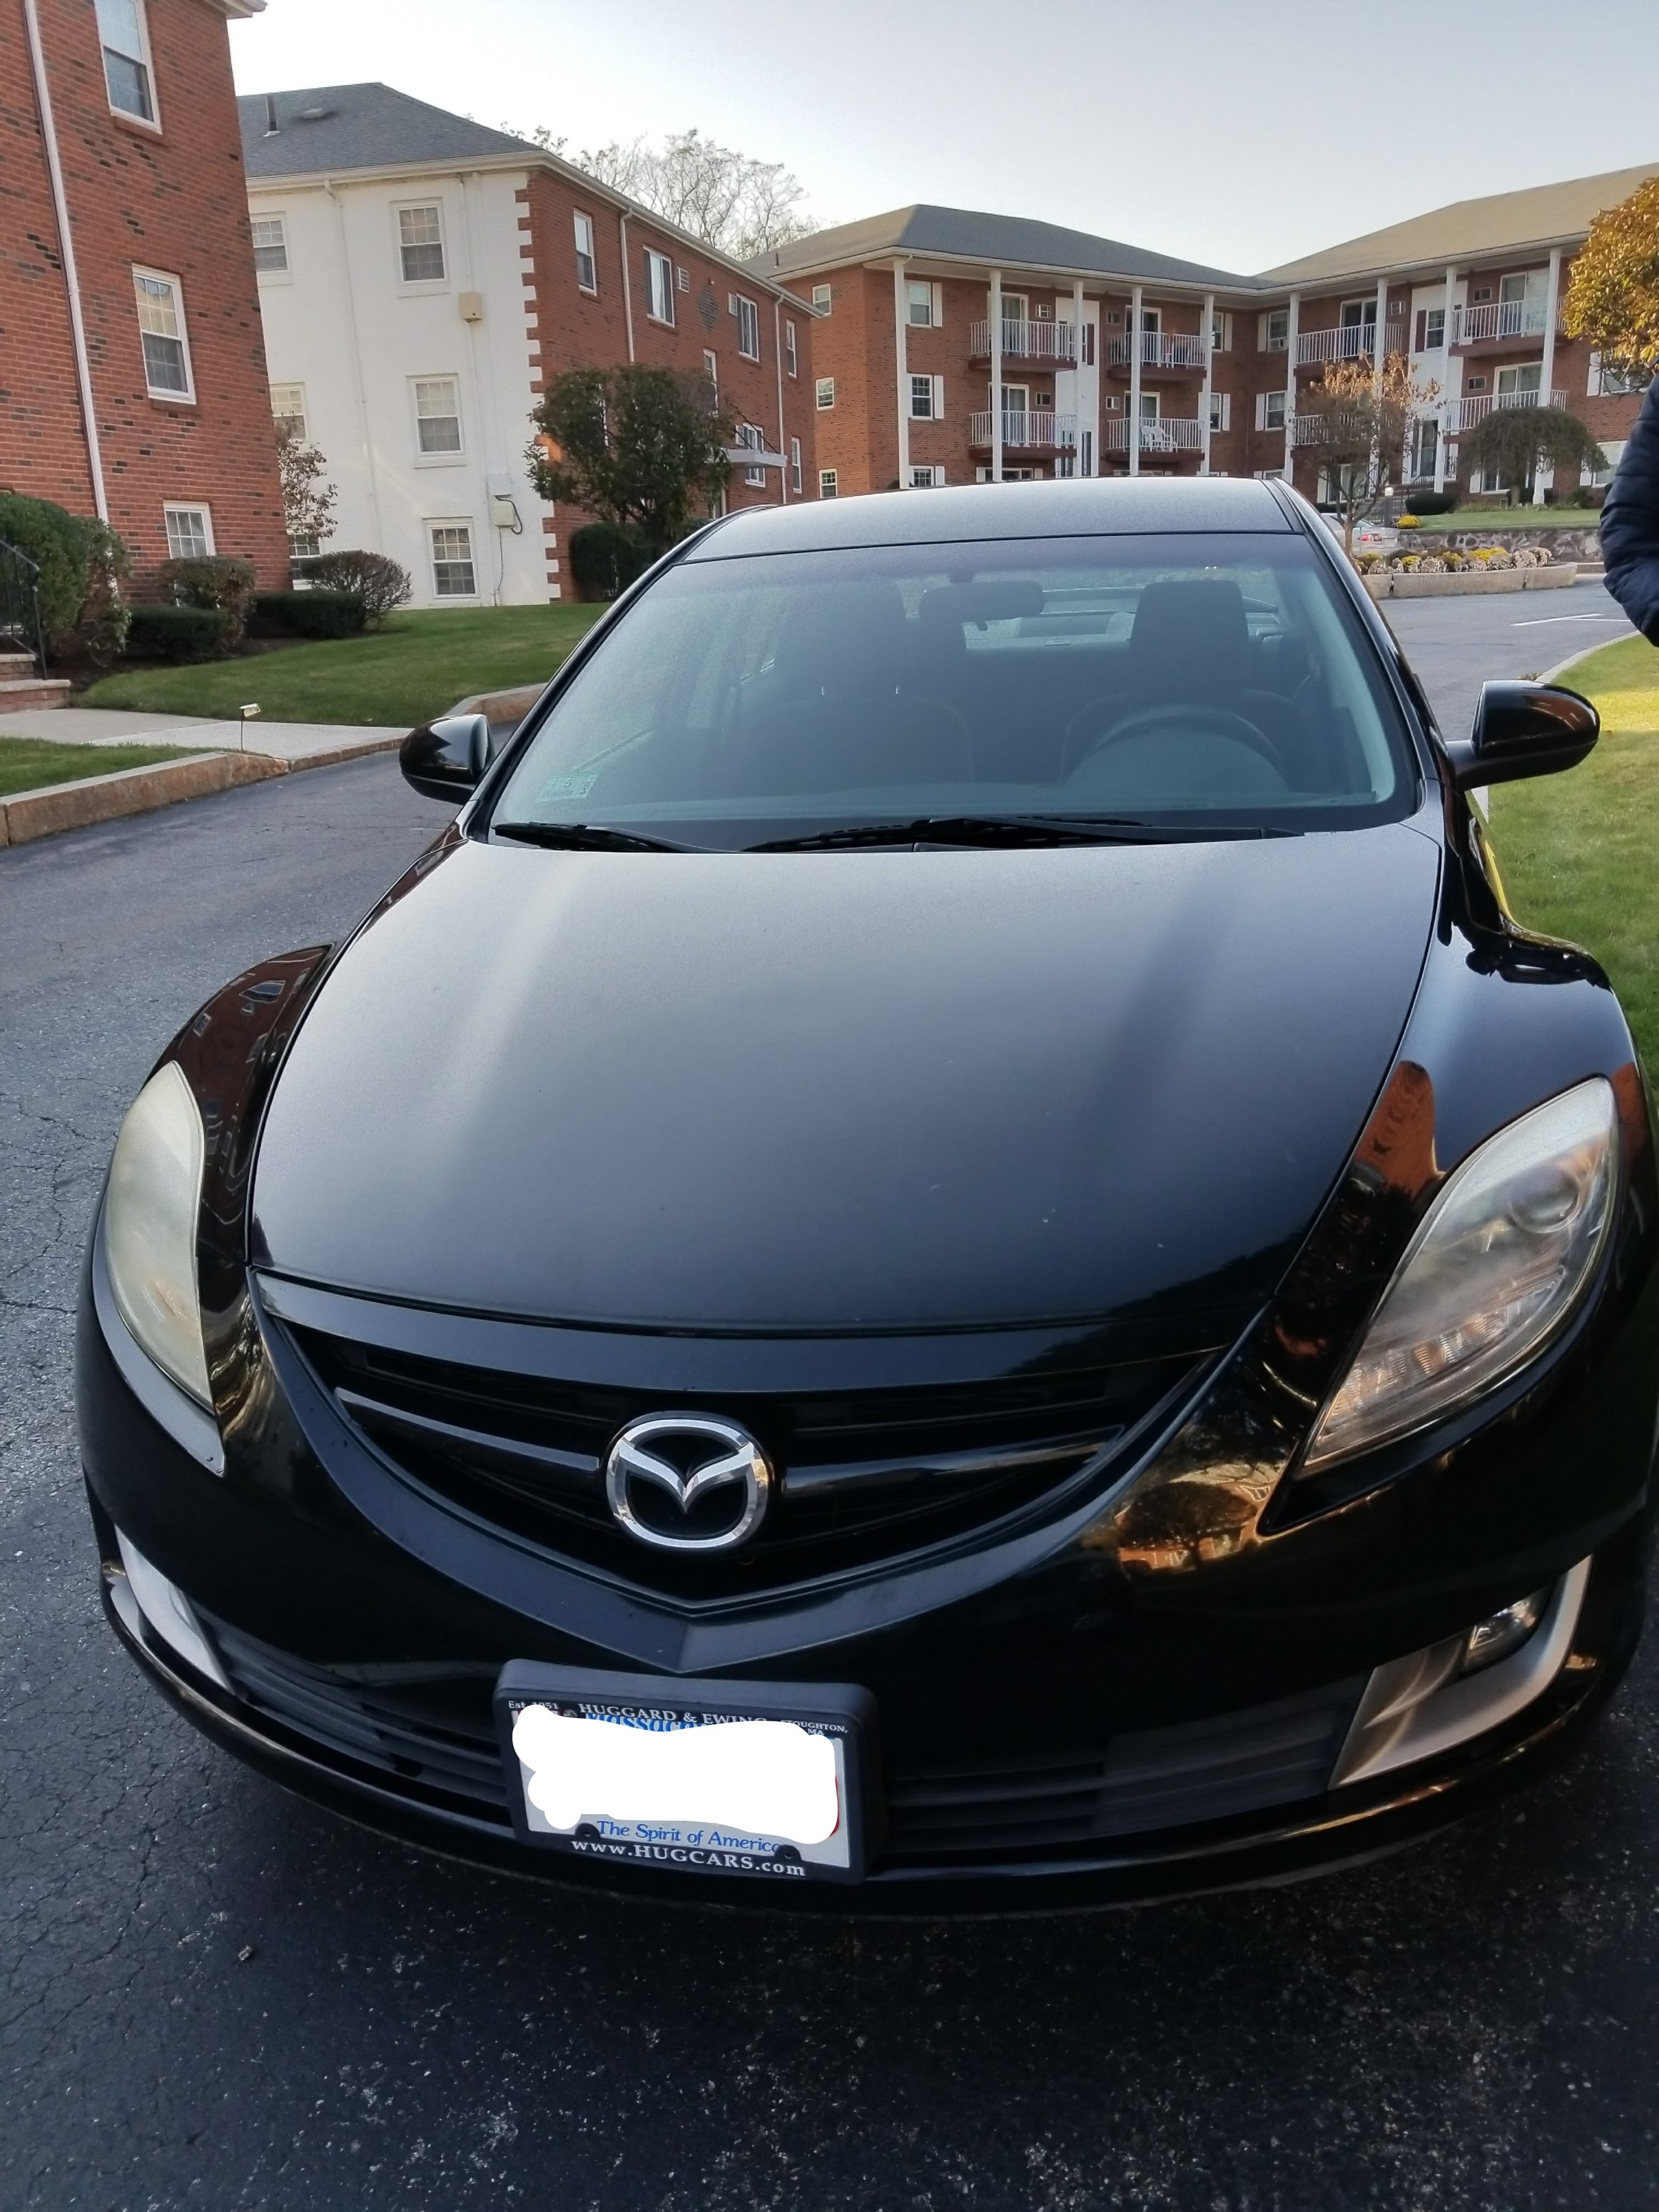 hatchback ken door ukiah in htm fowler pre mazda for touring ca vehicles sale owned featured auto